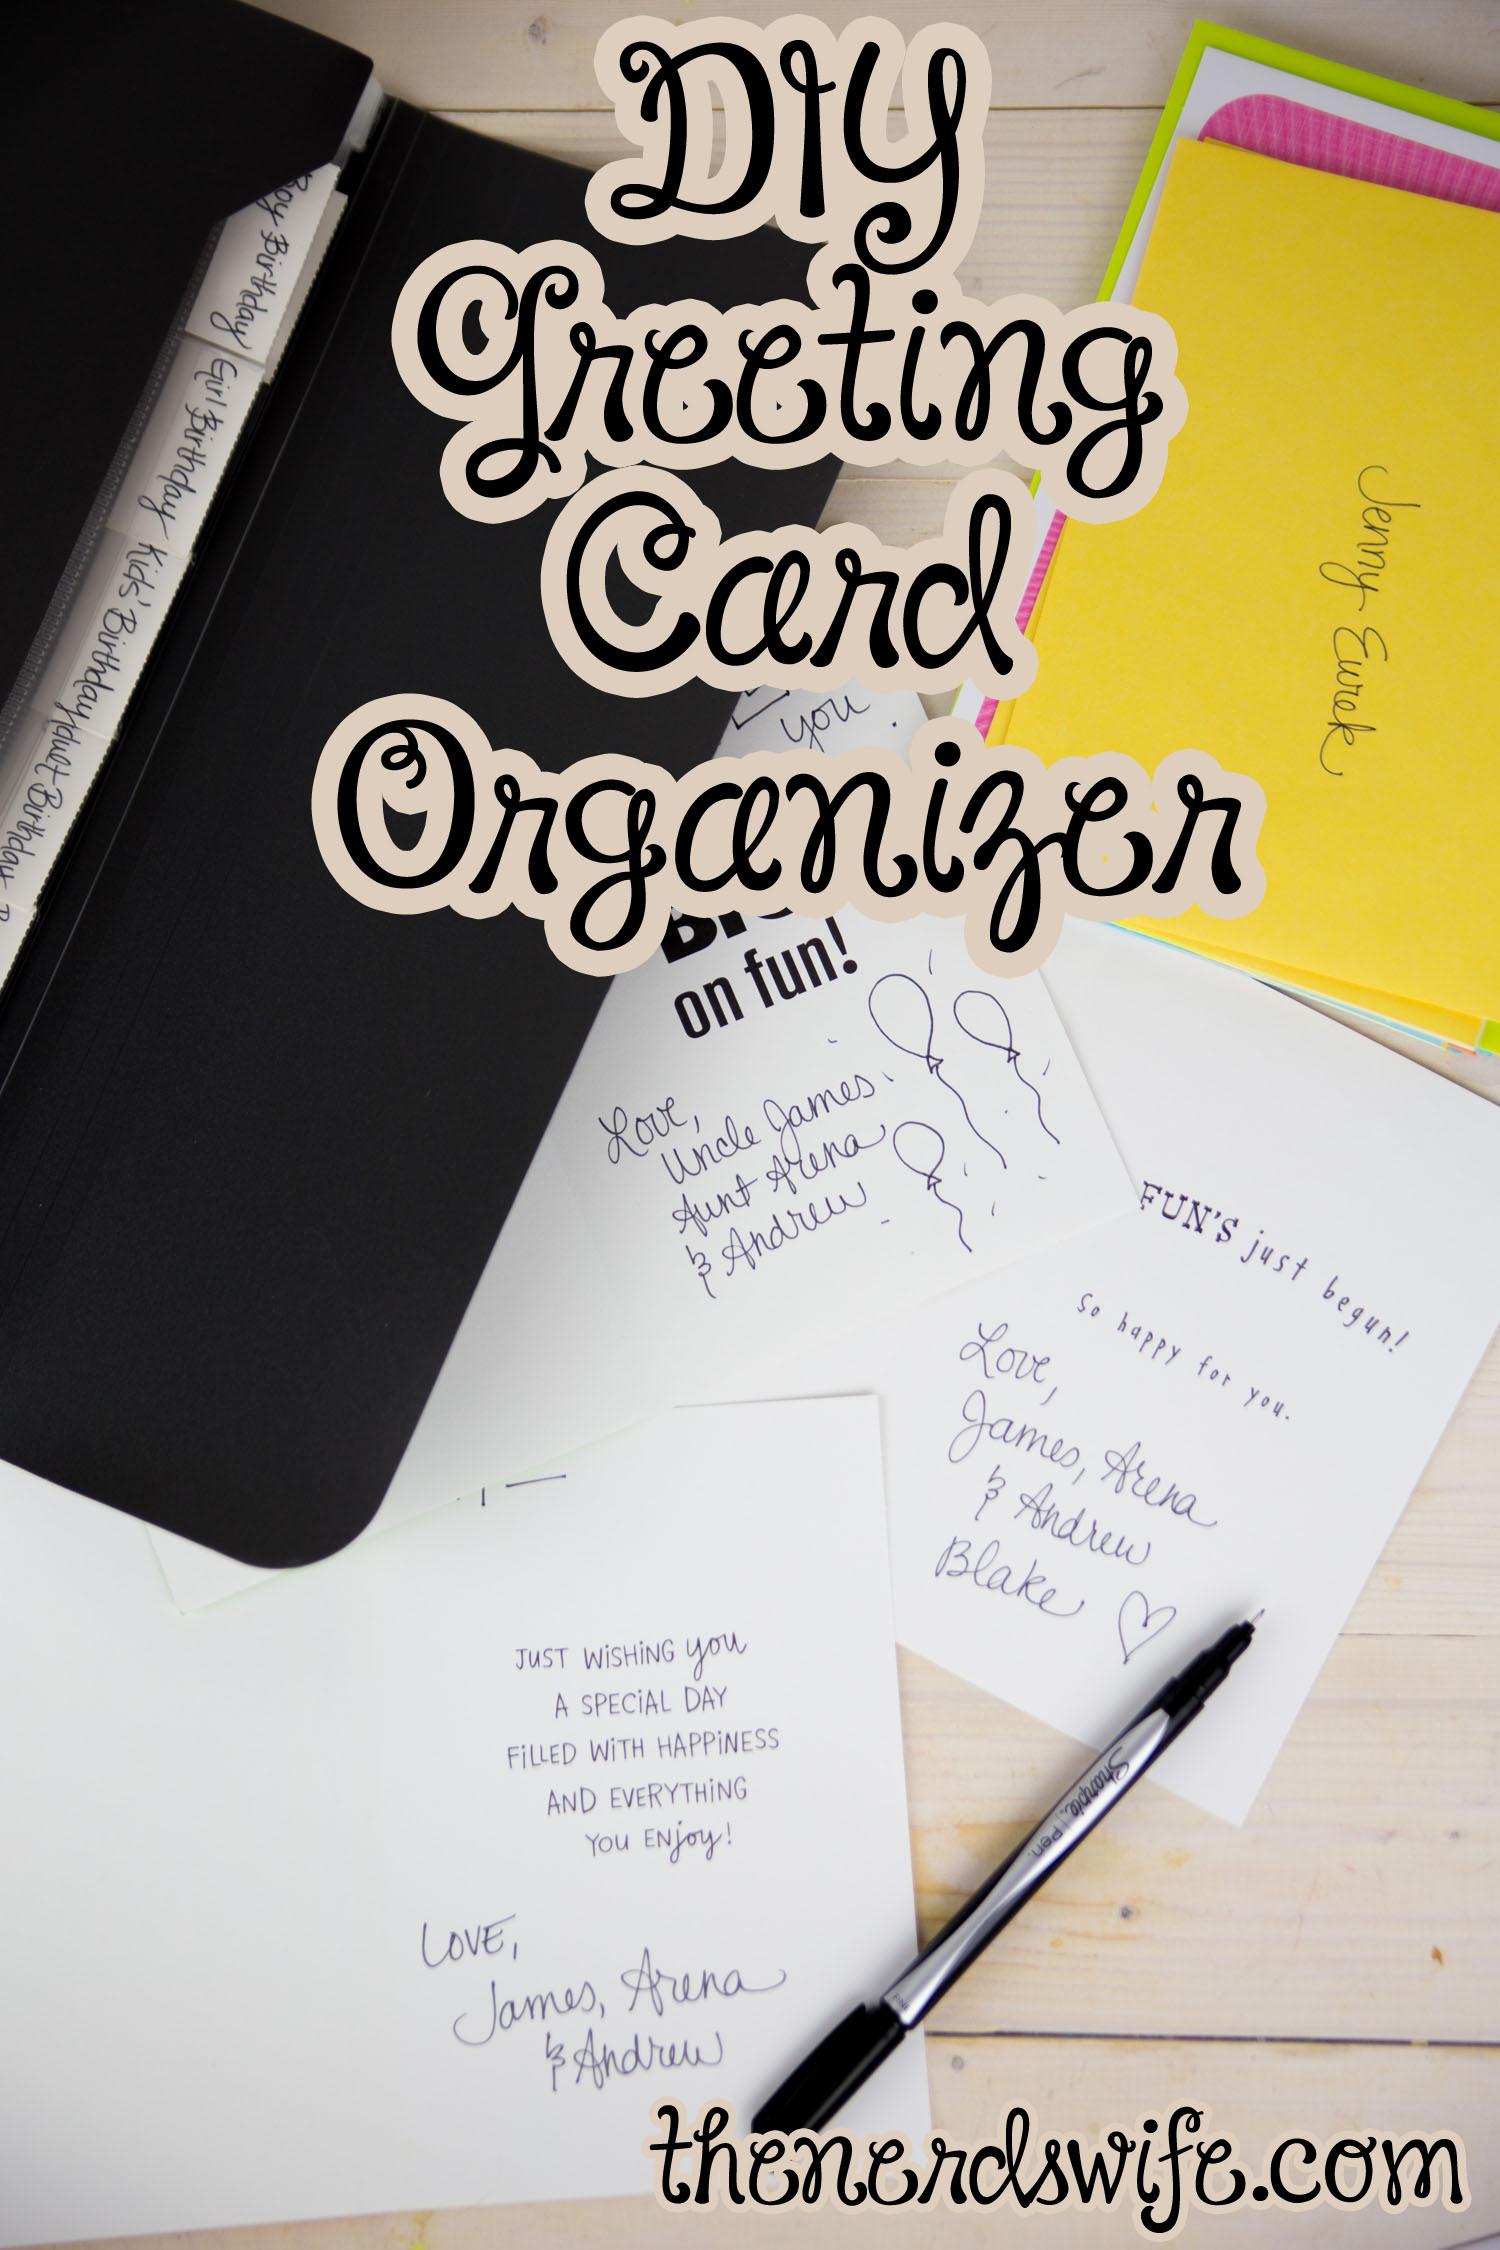 Diy greeting card organizer and hallmark valuecards shop colourmoves Choice Image